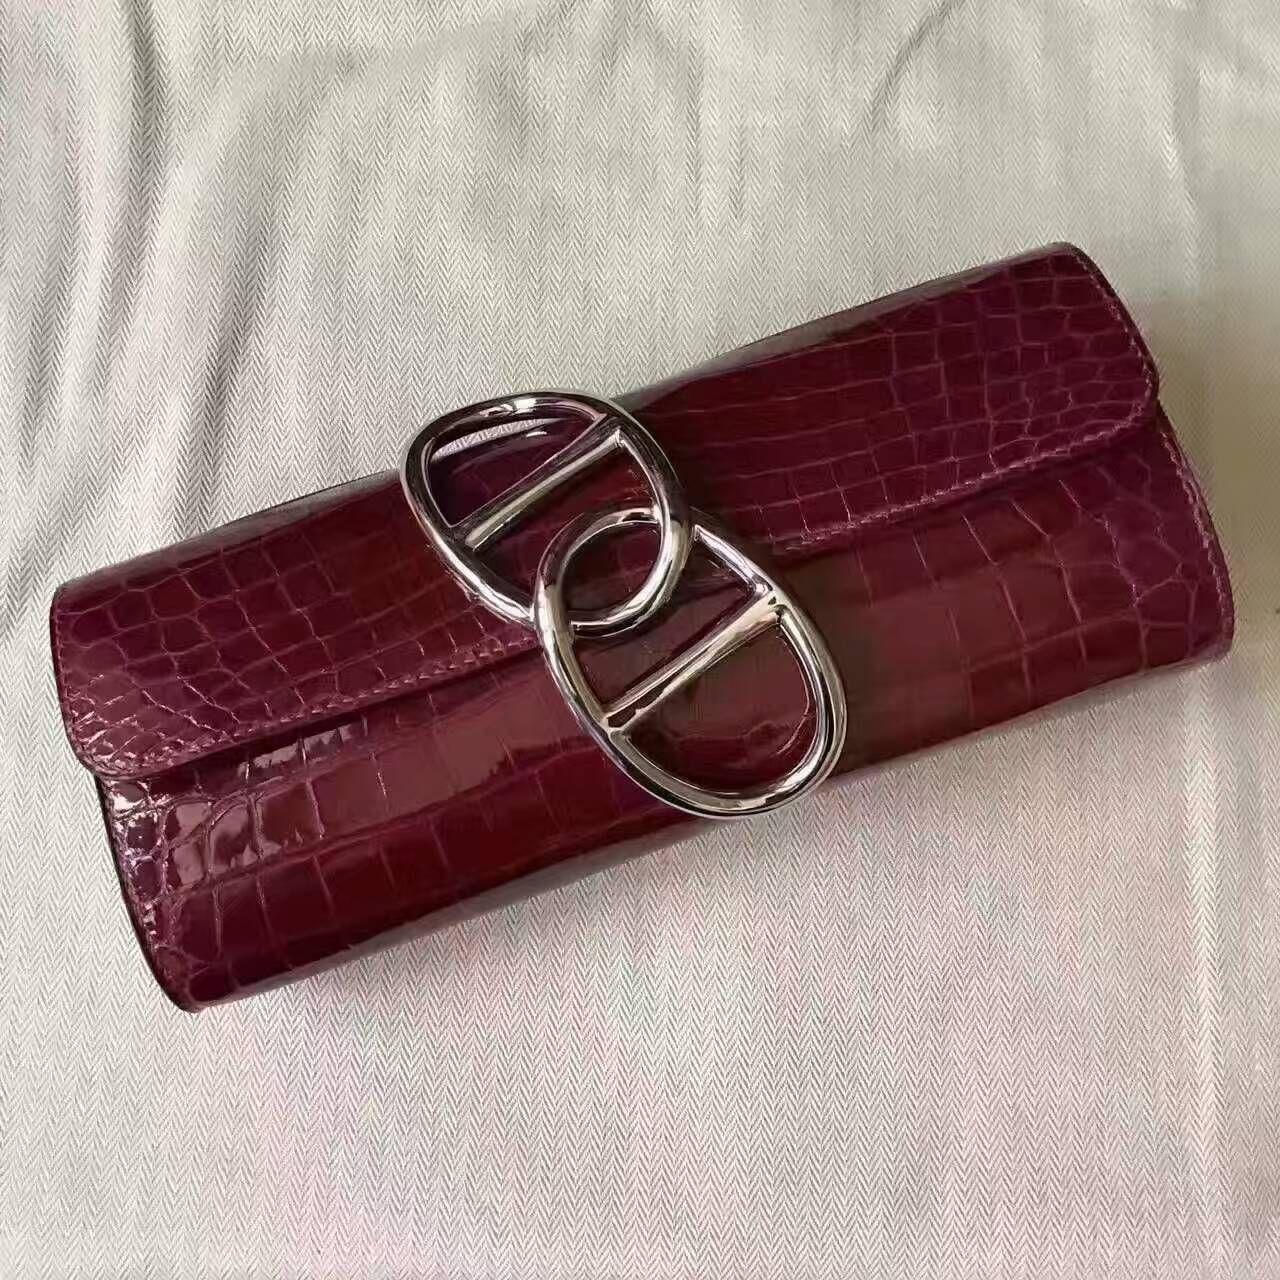 7c975724601a  Latest Hermes evening bags Summer 2017-cheap Hermes Crocodile Egée Evening  Clutch Bag Burgundy